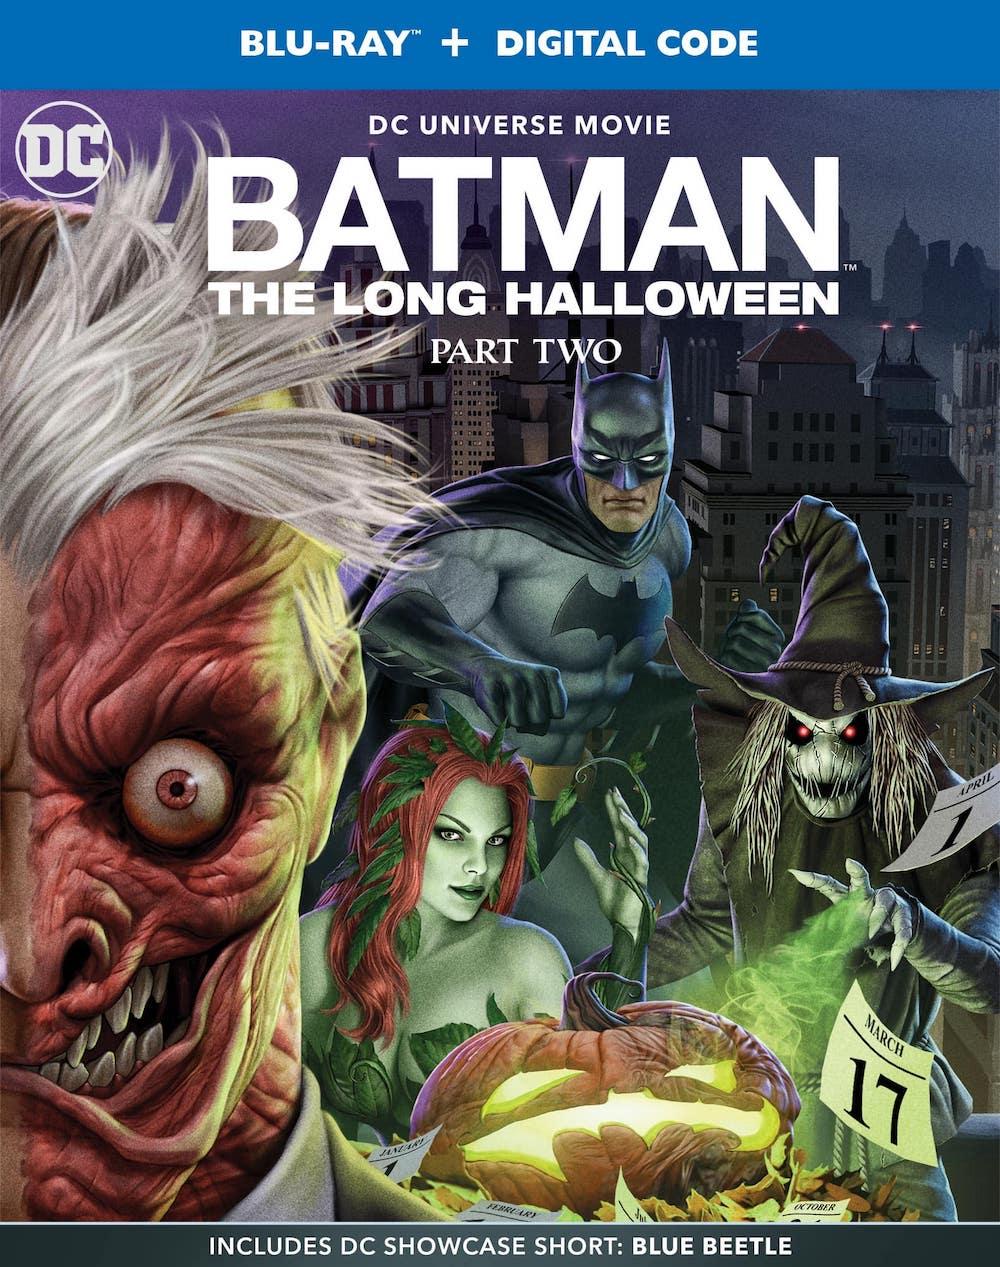 Batman: The Long Halloween, Part Two Blu-ray Cover Art